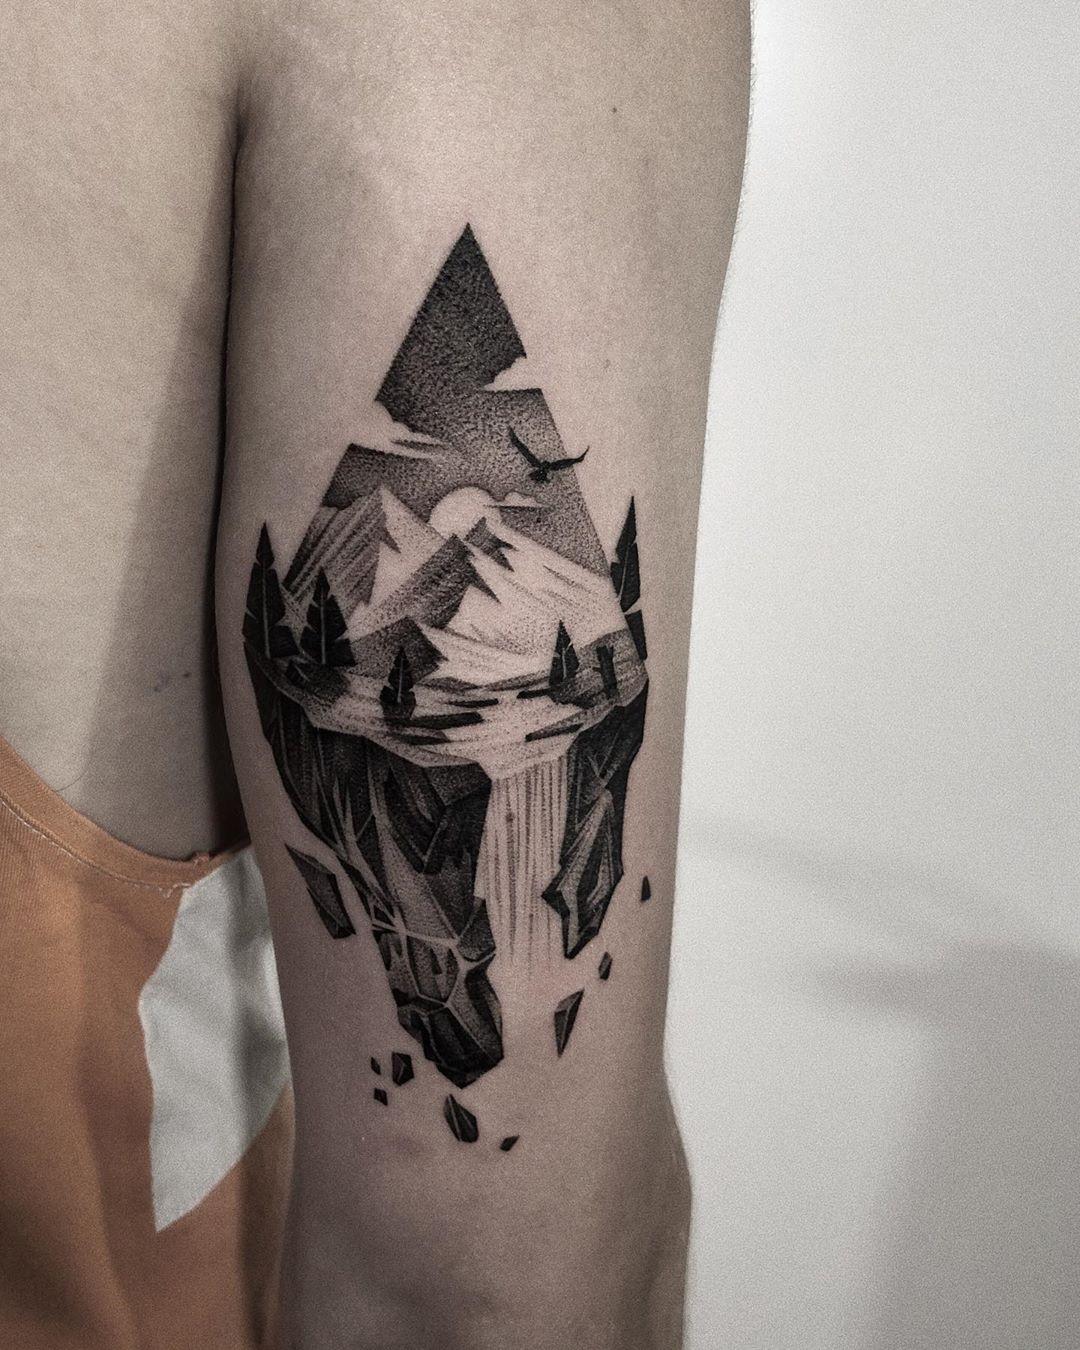 Inksearch tattoo Patryk Chybowski (Boski Tattoo)